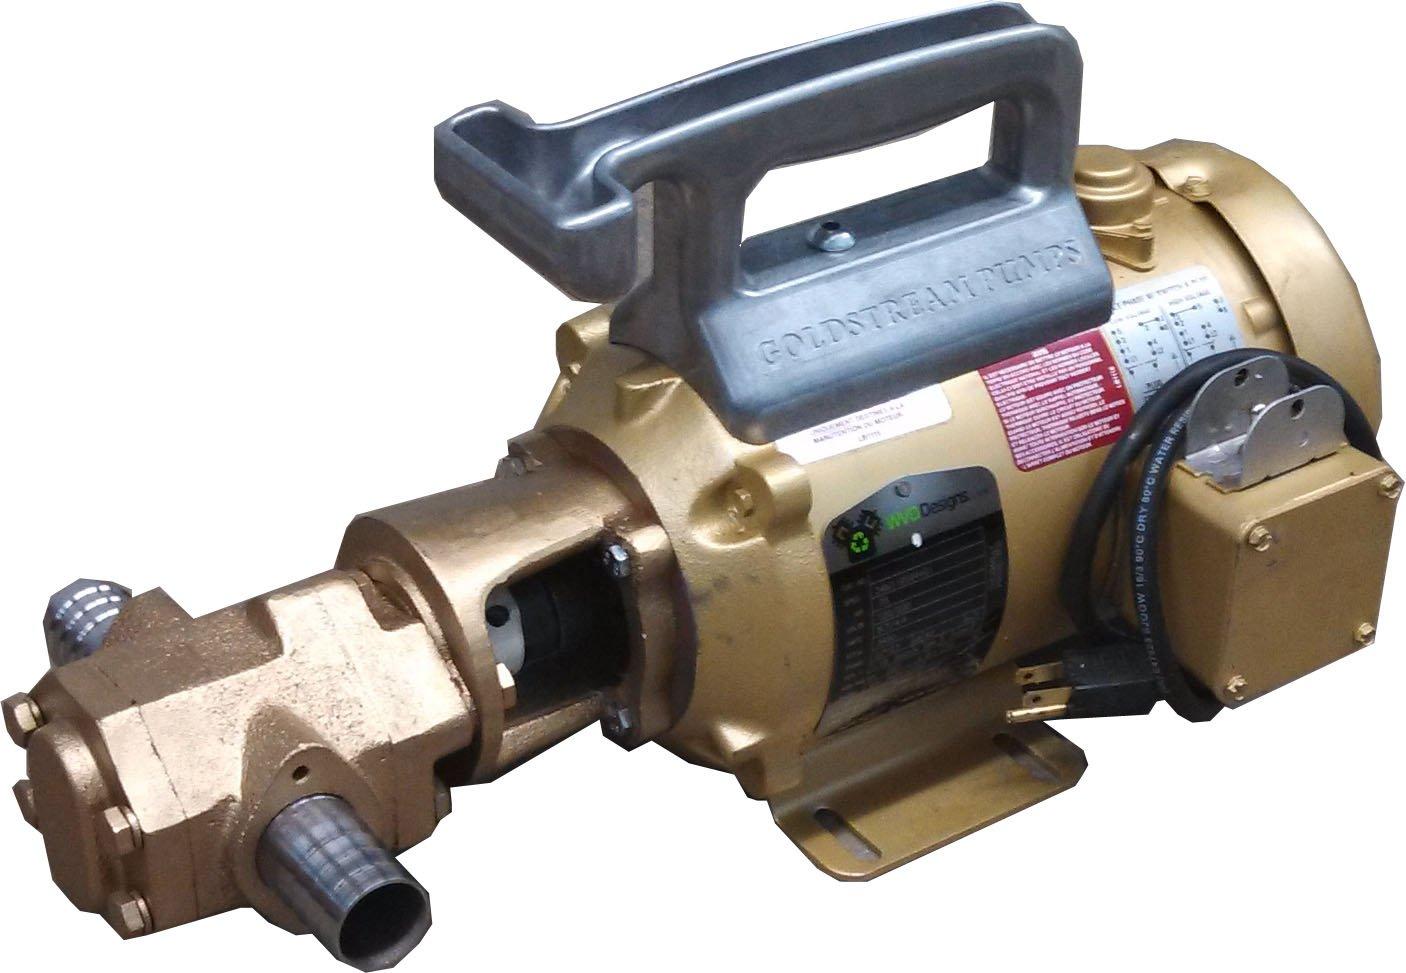 Goldstream Pumps 25gpm Portable Oil Pump